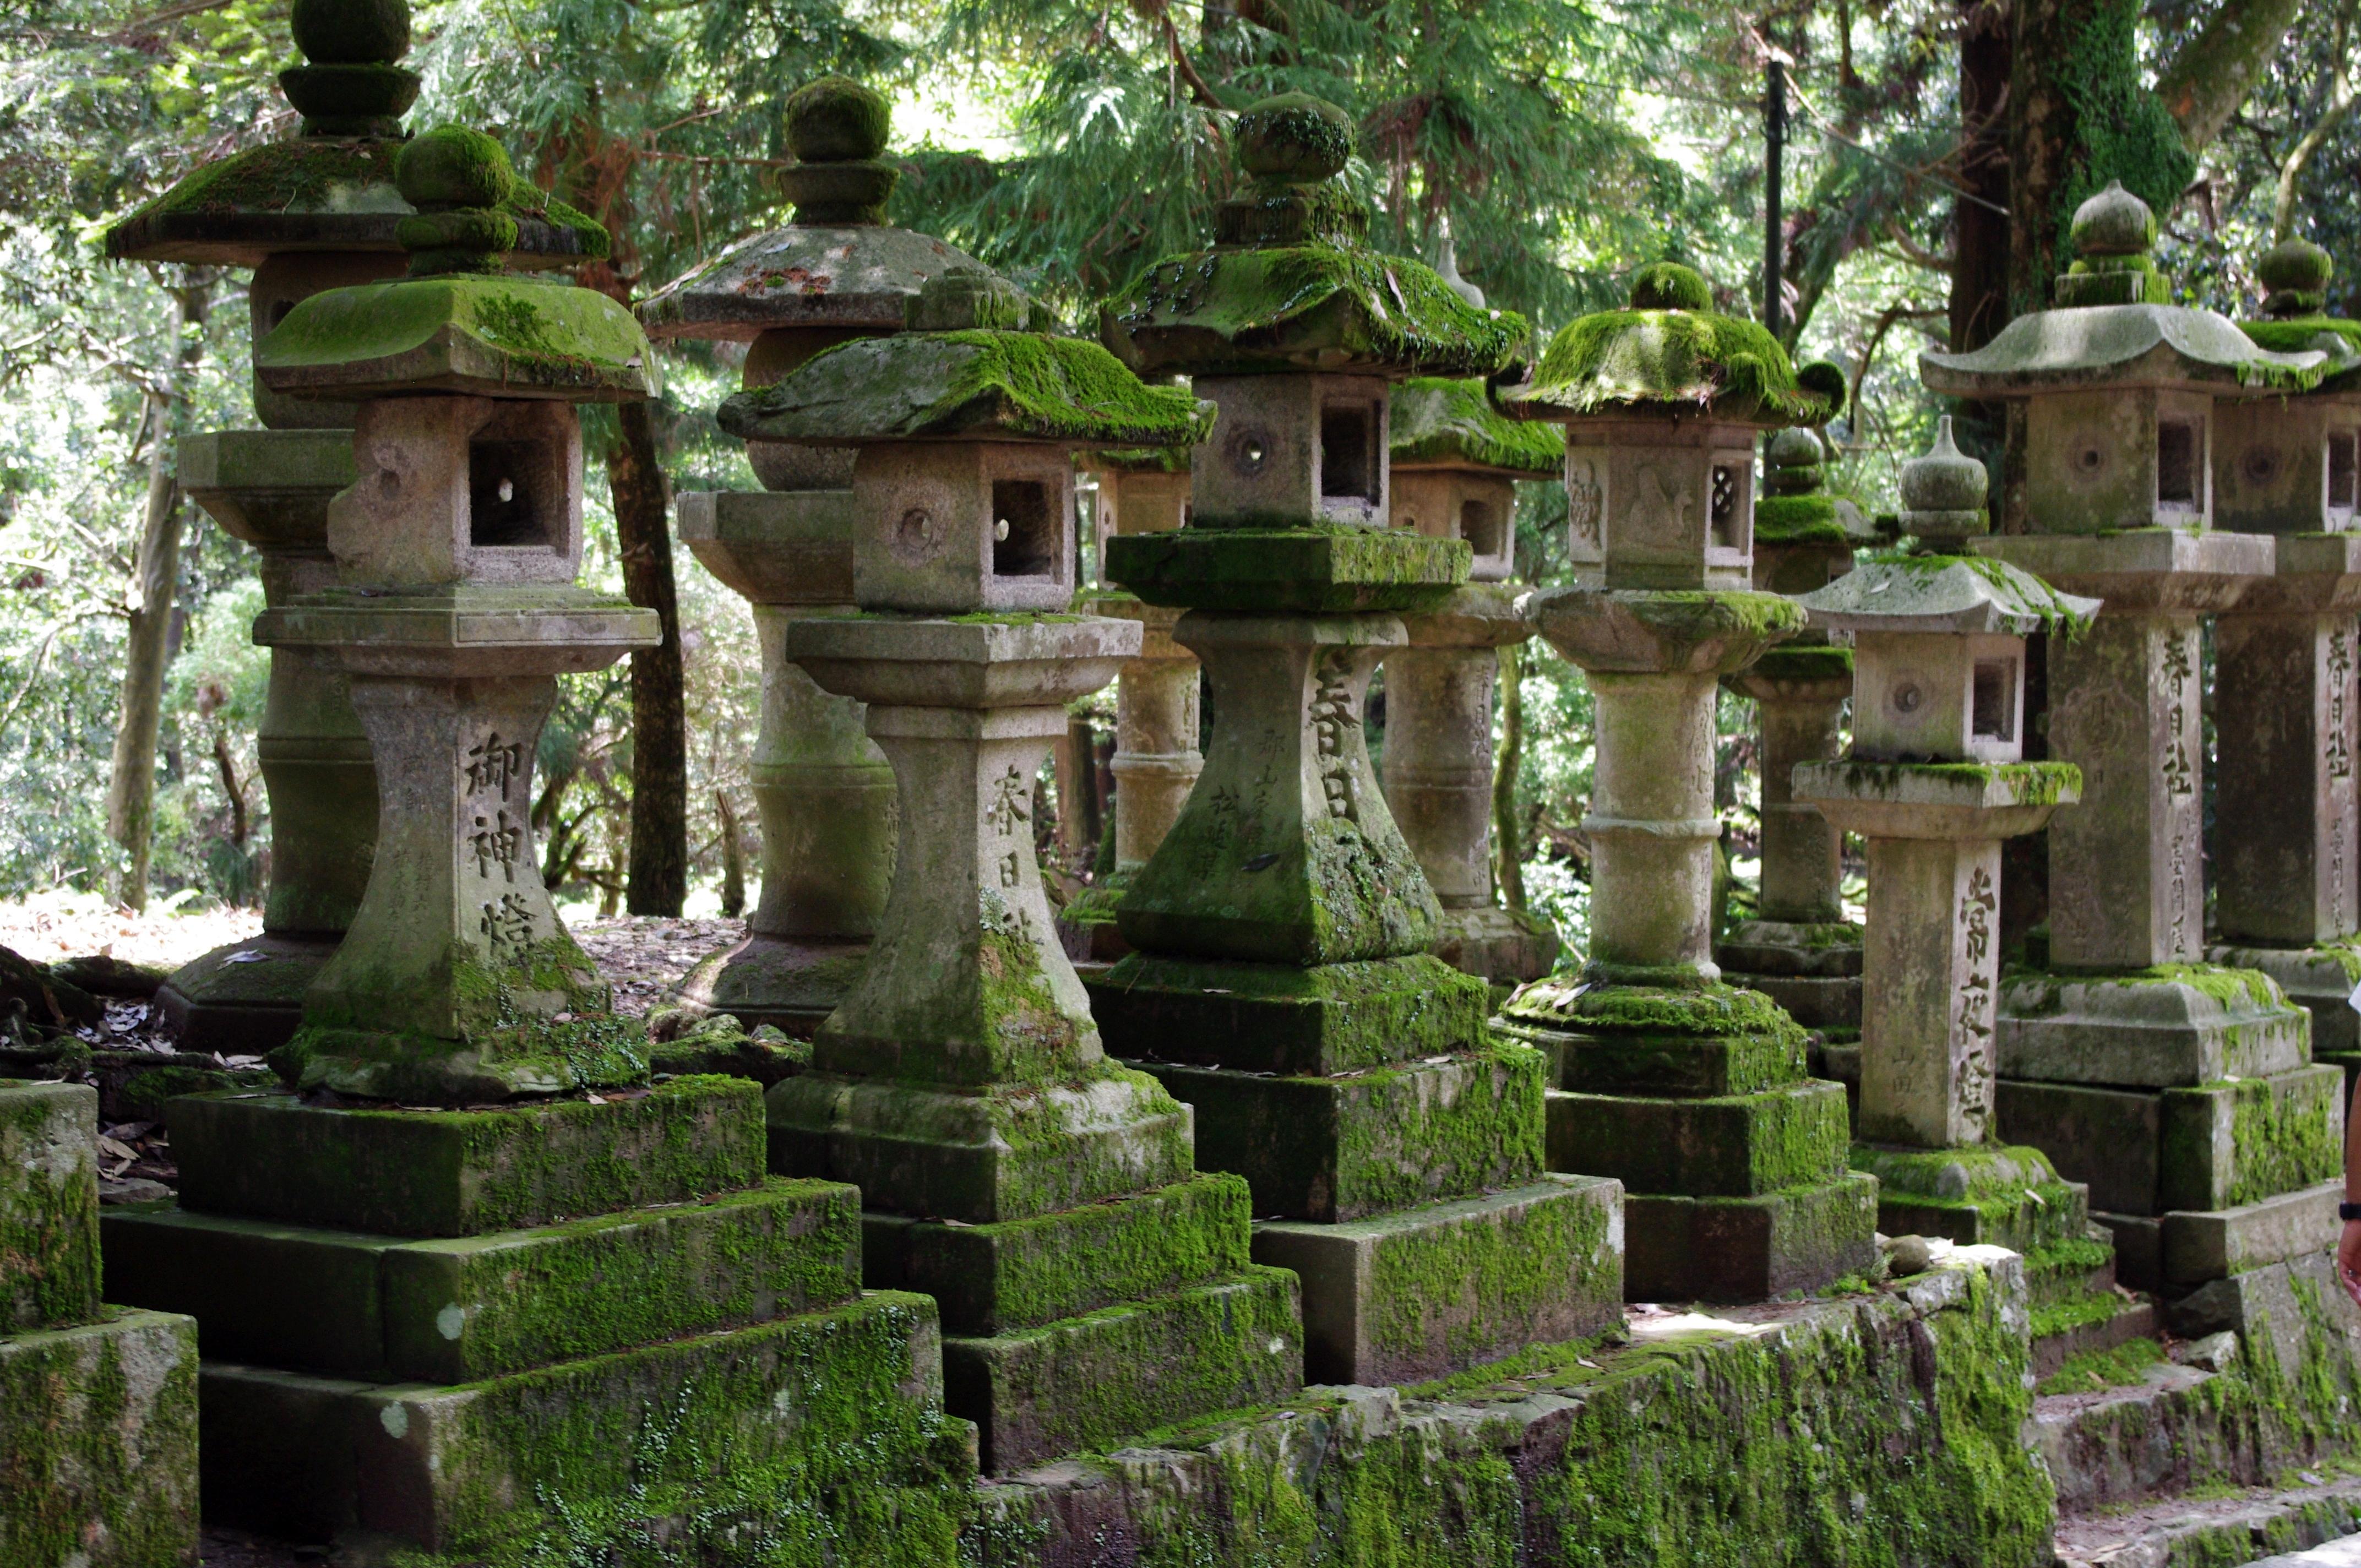 Small Garden Plans File 20100716 Nara Stone Lanterns 2212 Jpg Wikimedia Commons